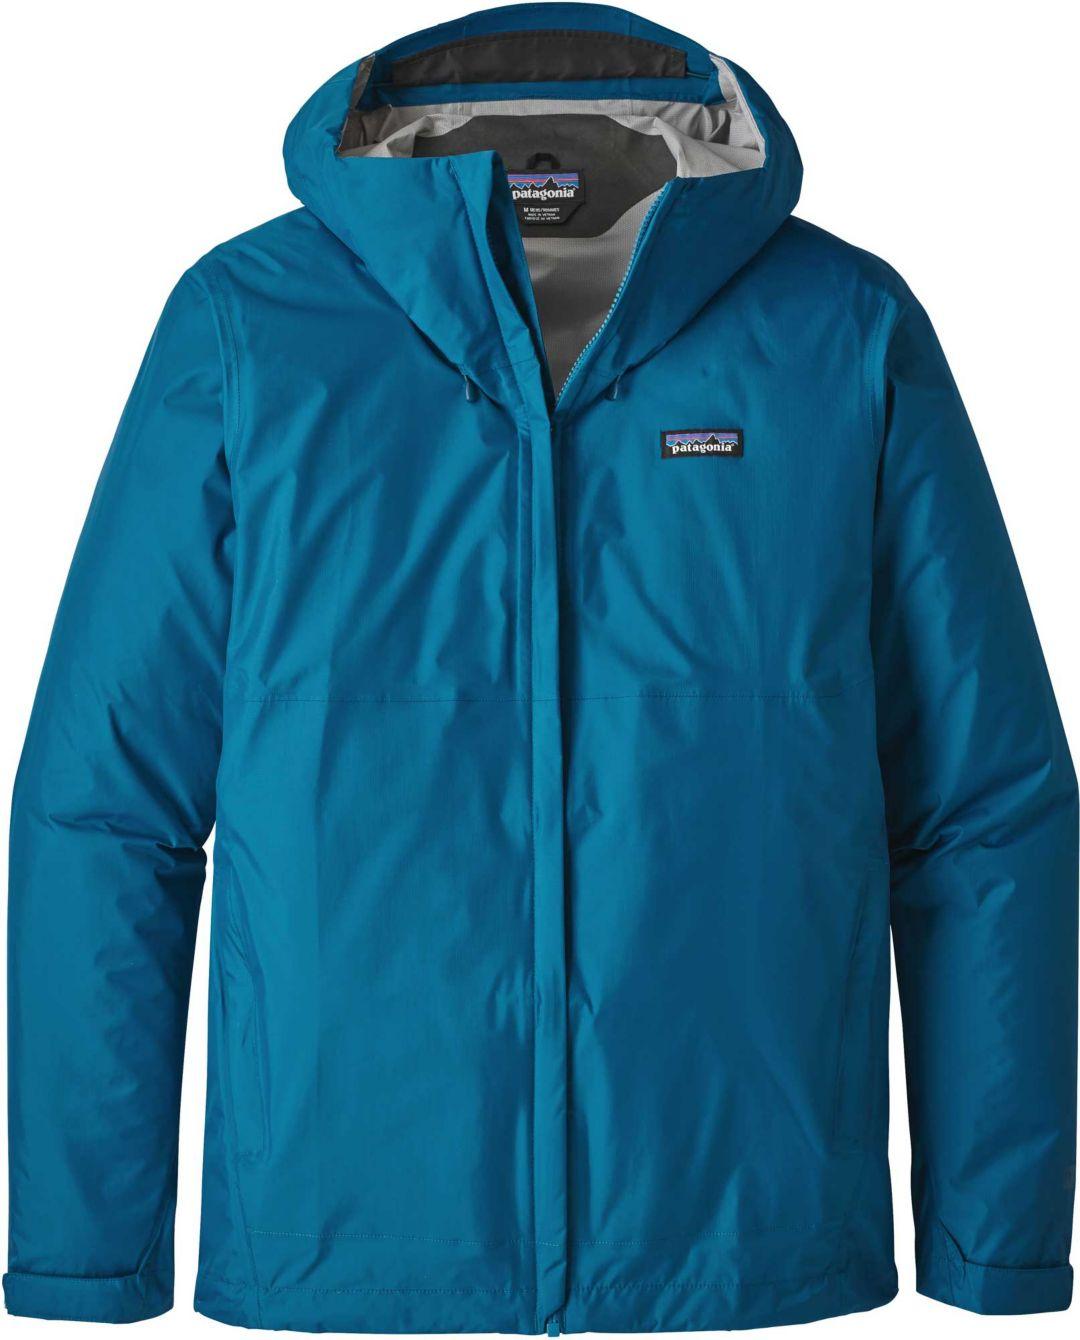 fd28ec66f6ed1 Patagonia Men's Torrentshell Shell Jacket